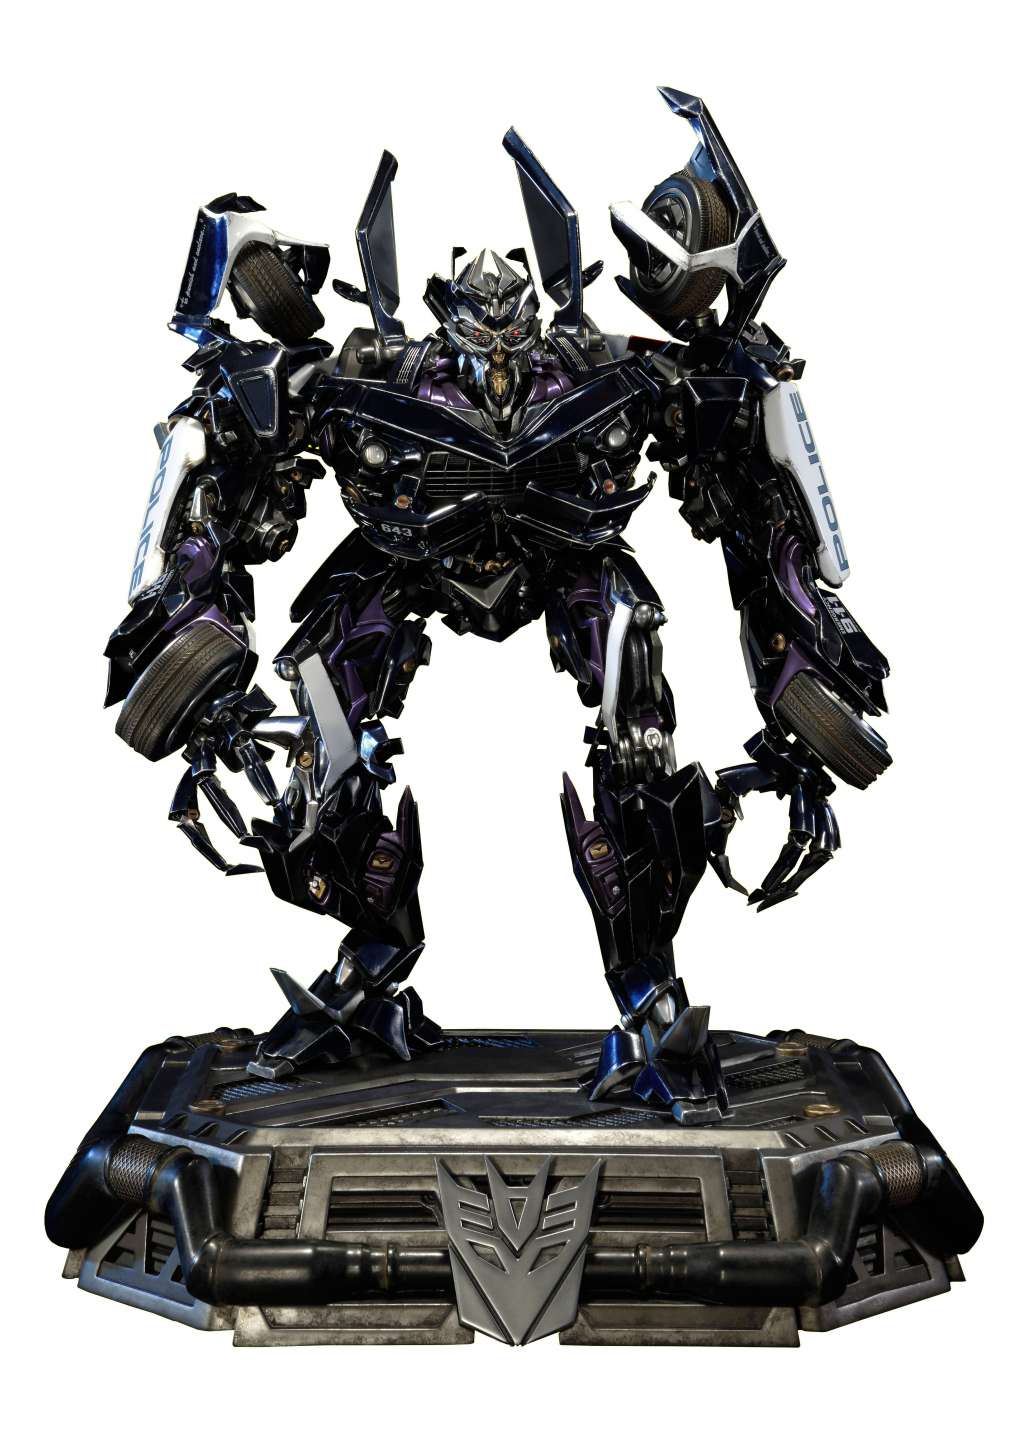 Transformers Figura Barricade 76 cm 02